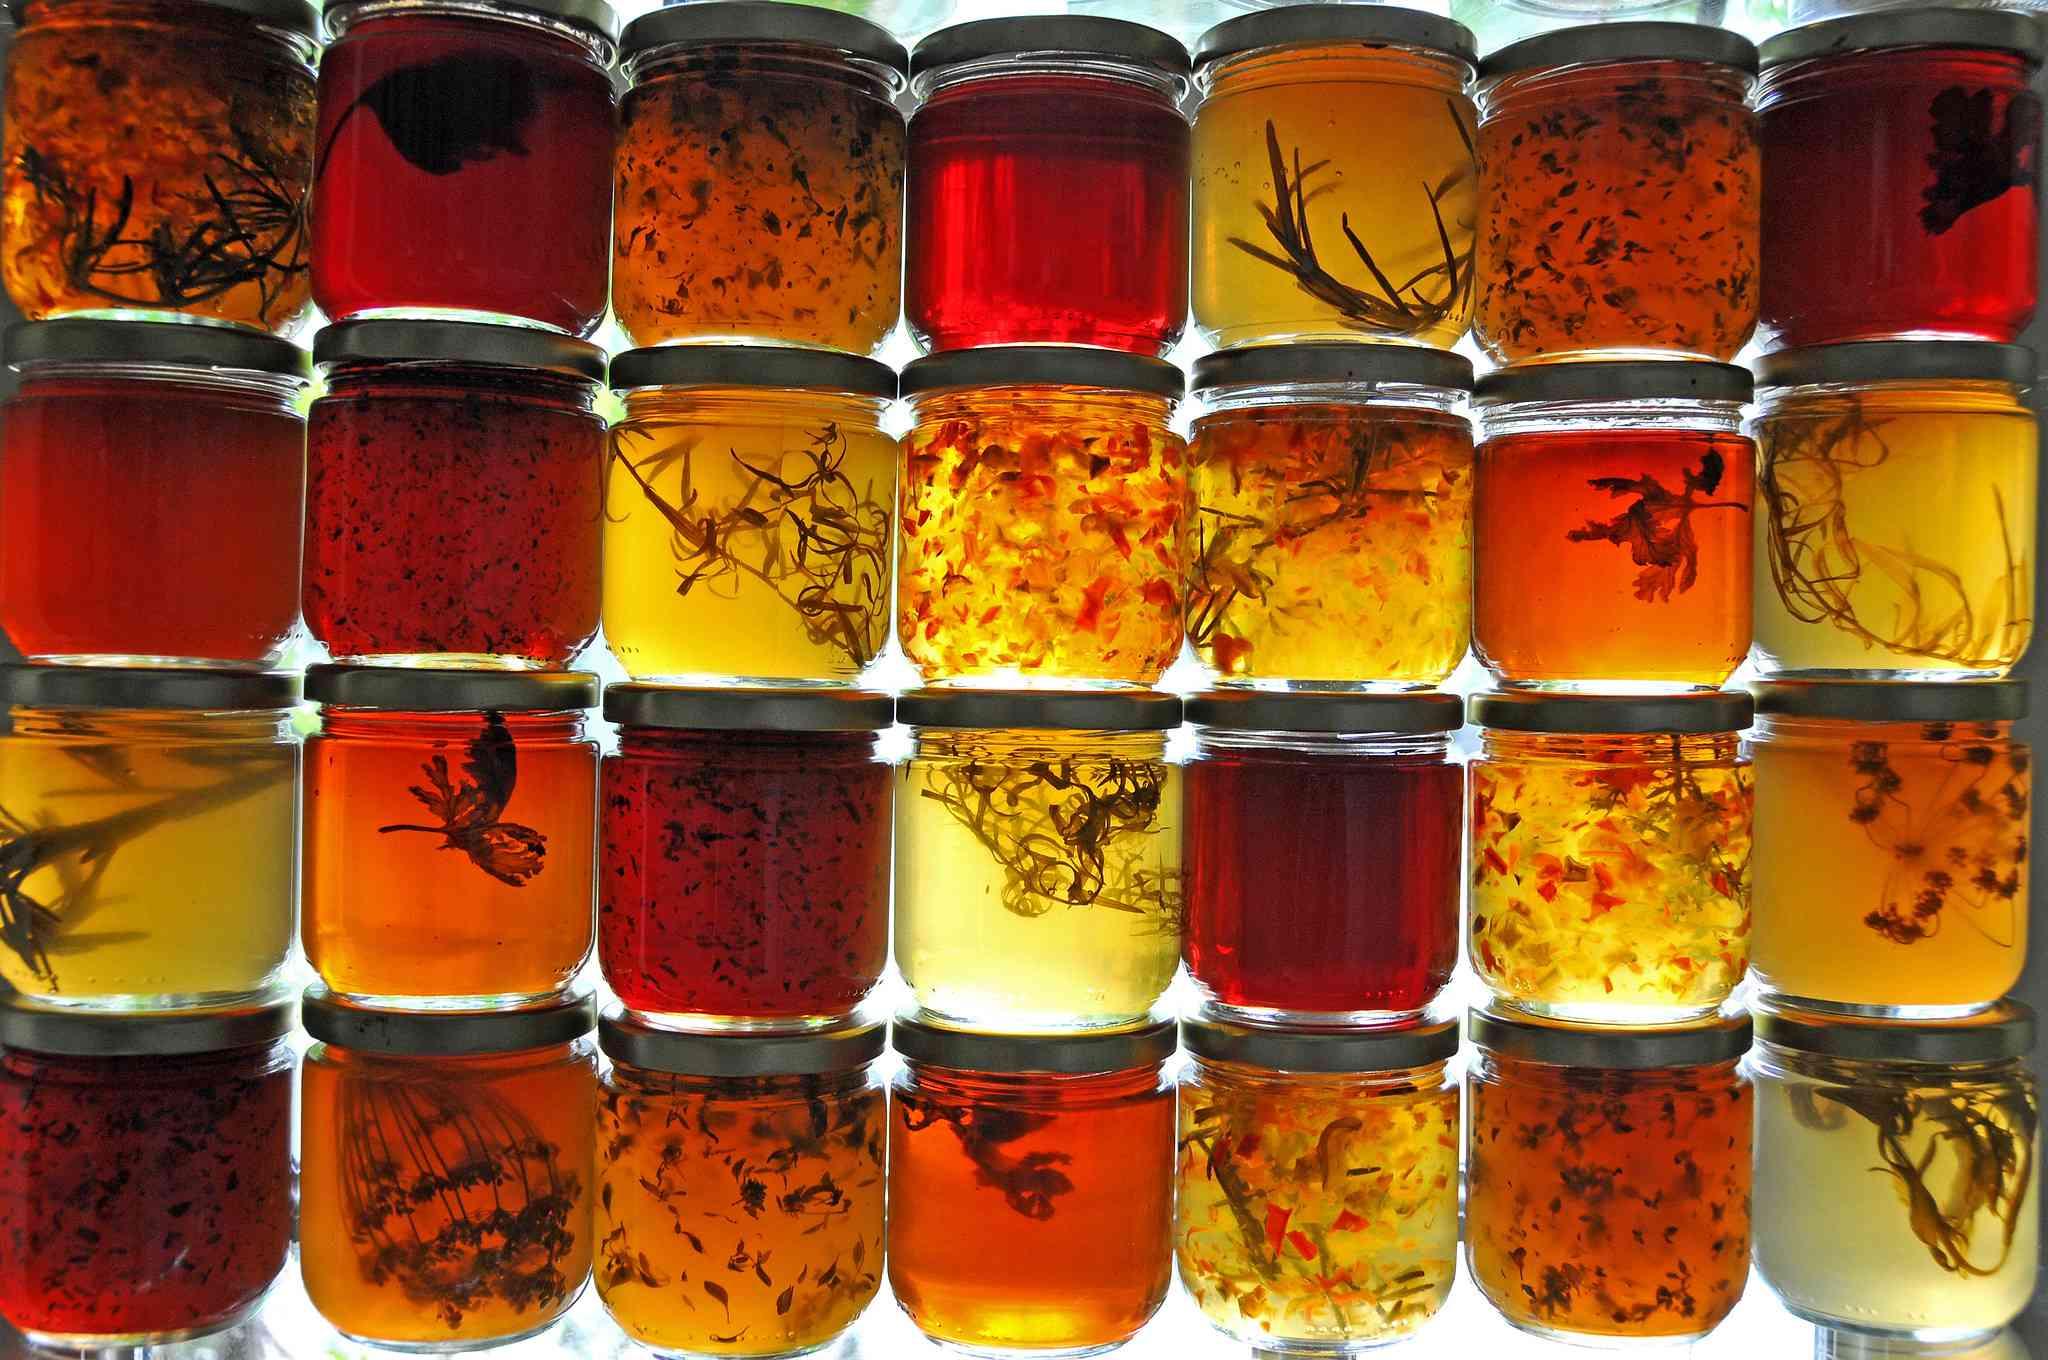 stacks on stacks of jelly jars